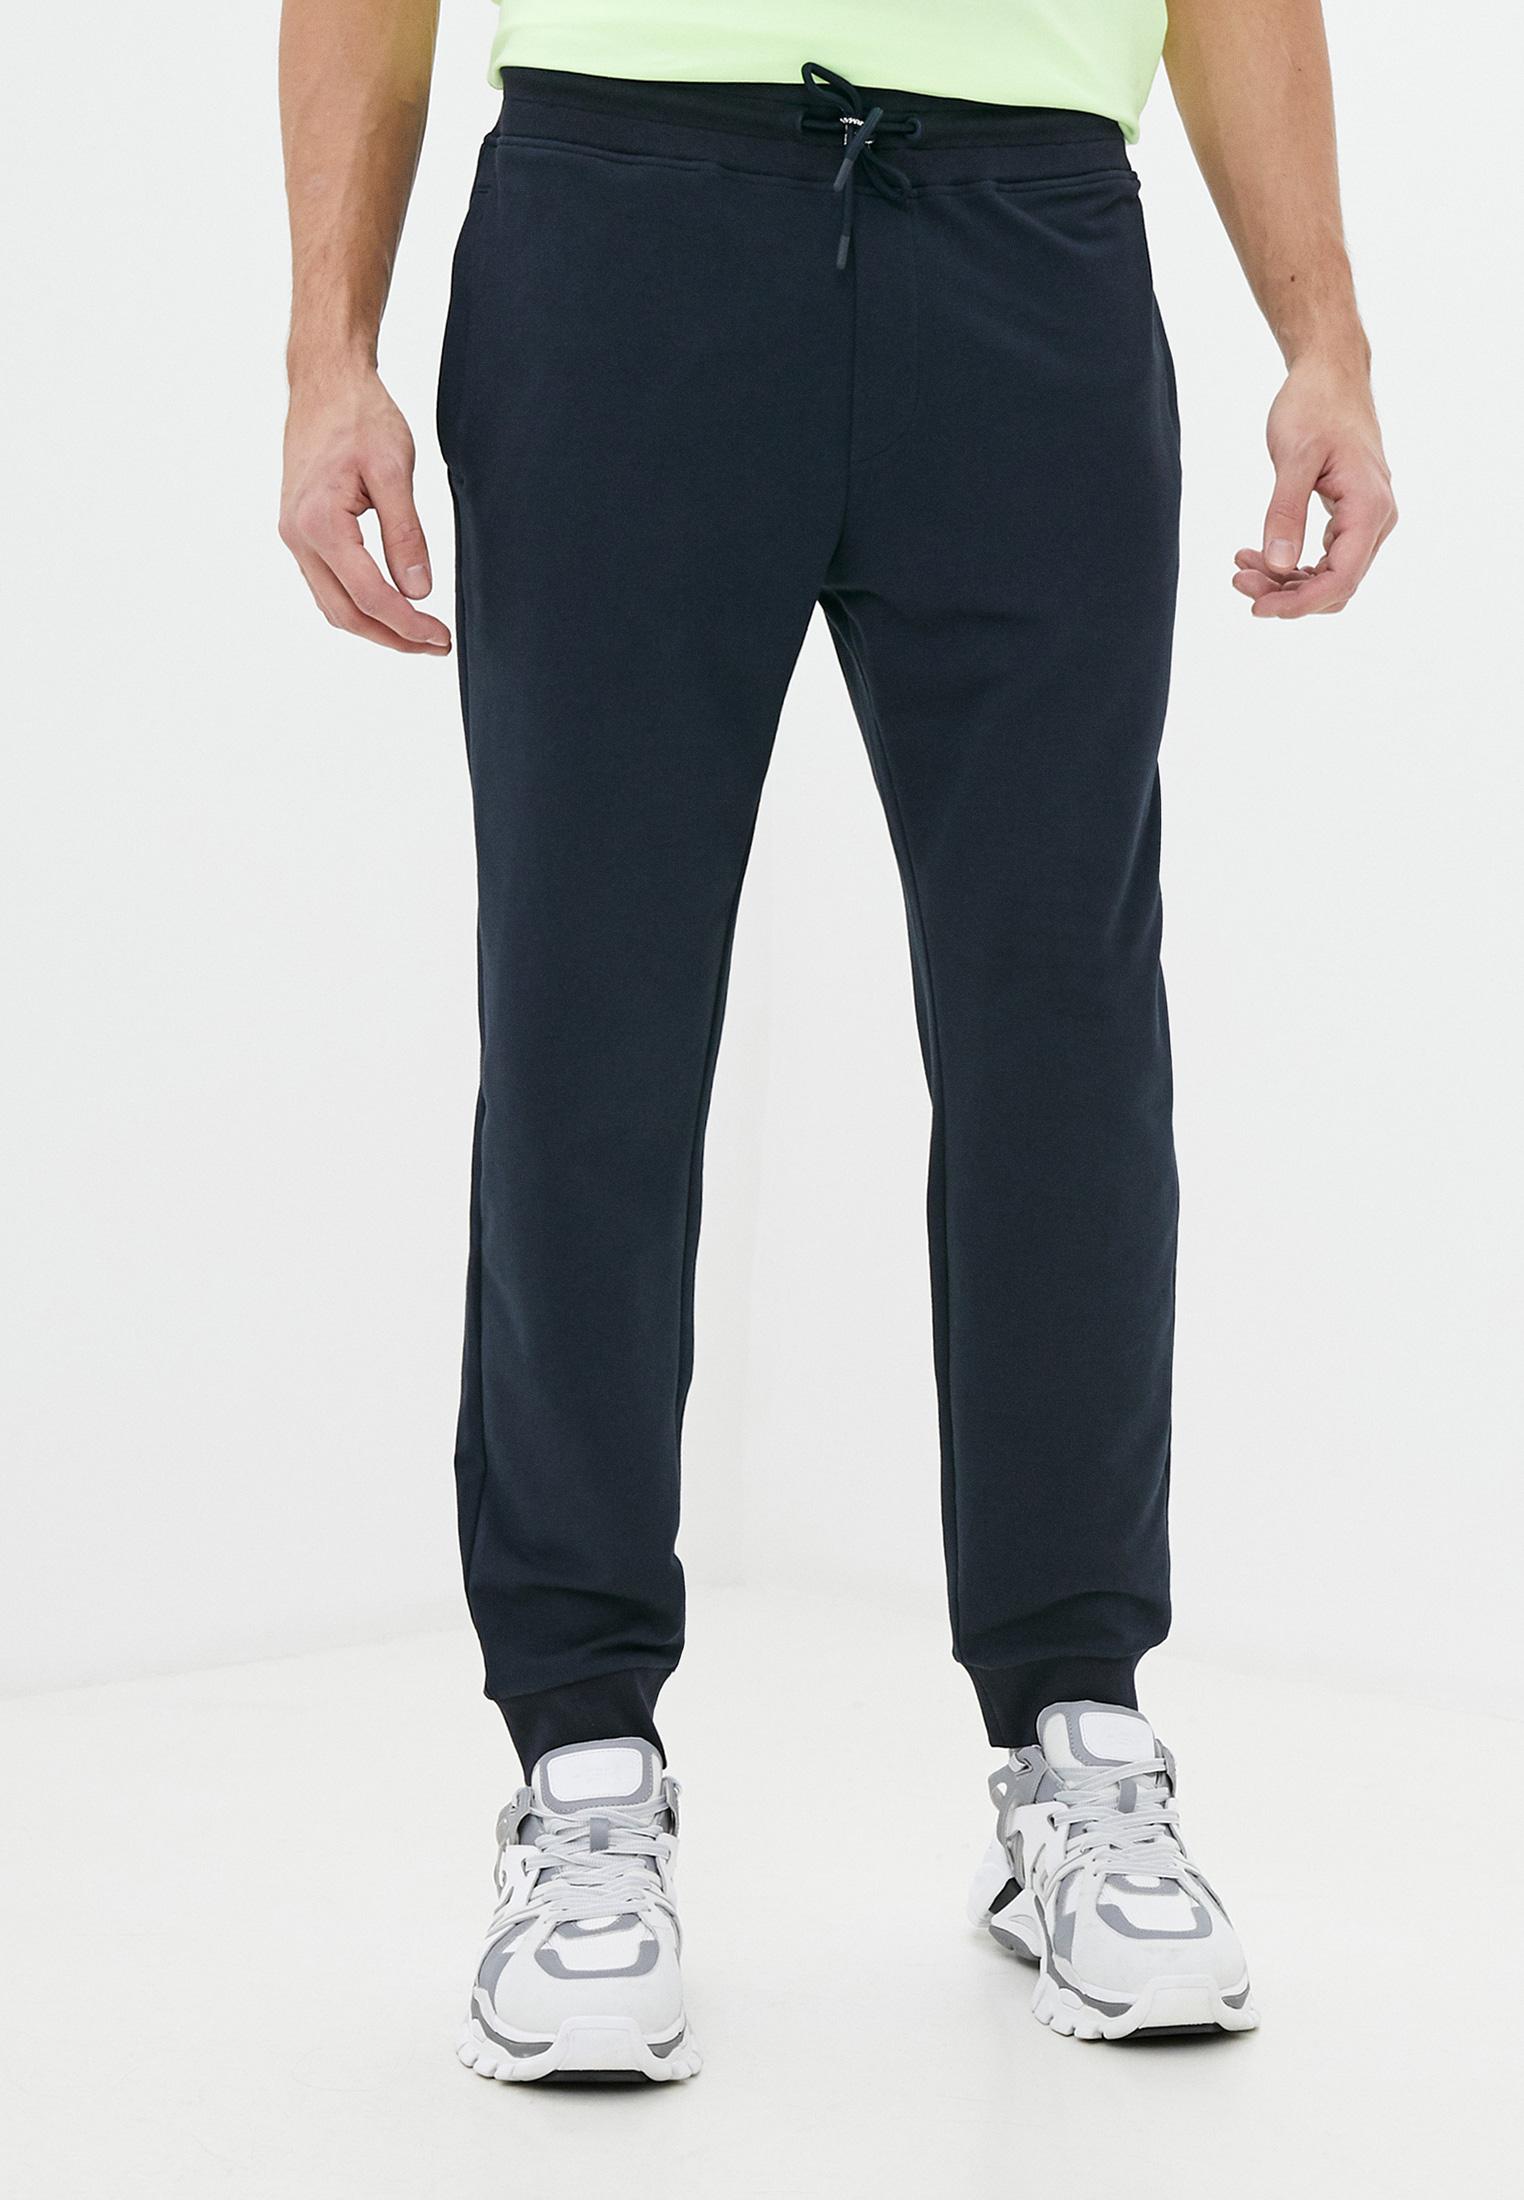 Мужские спортивные брюки Emporio Armani (Эмпорио Армани) 8n1p91 1J04Z